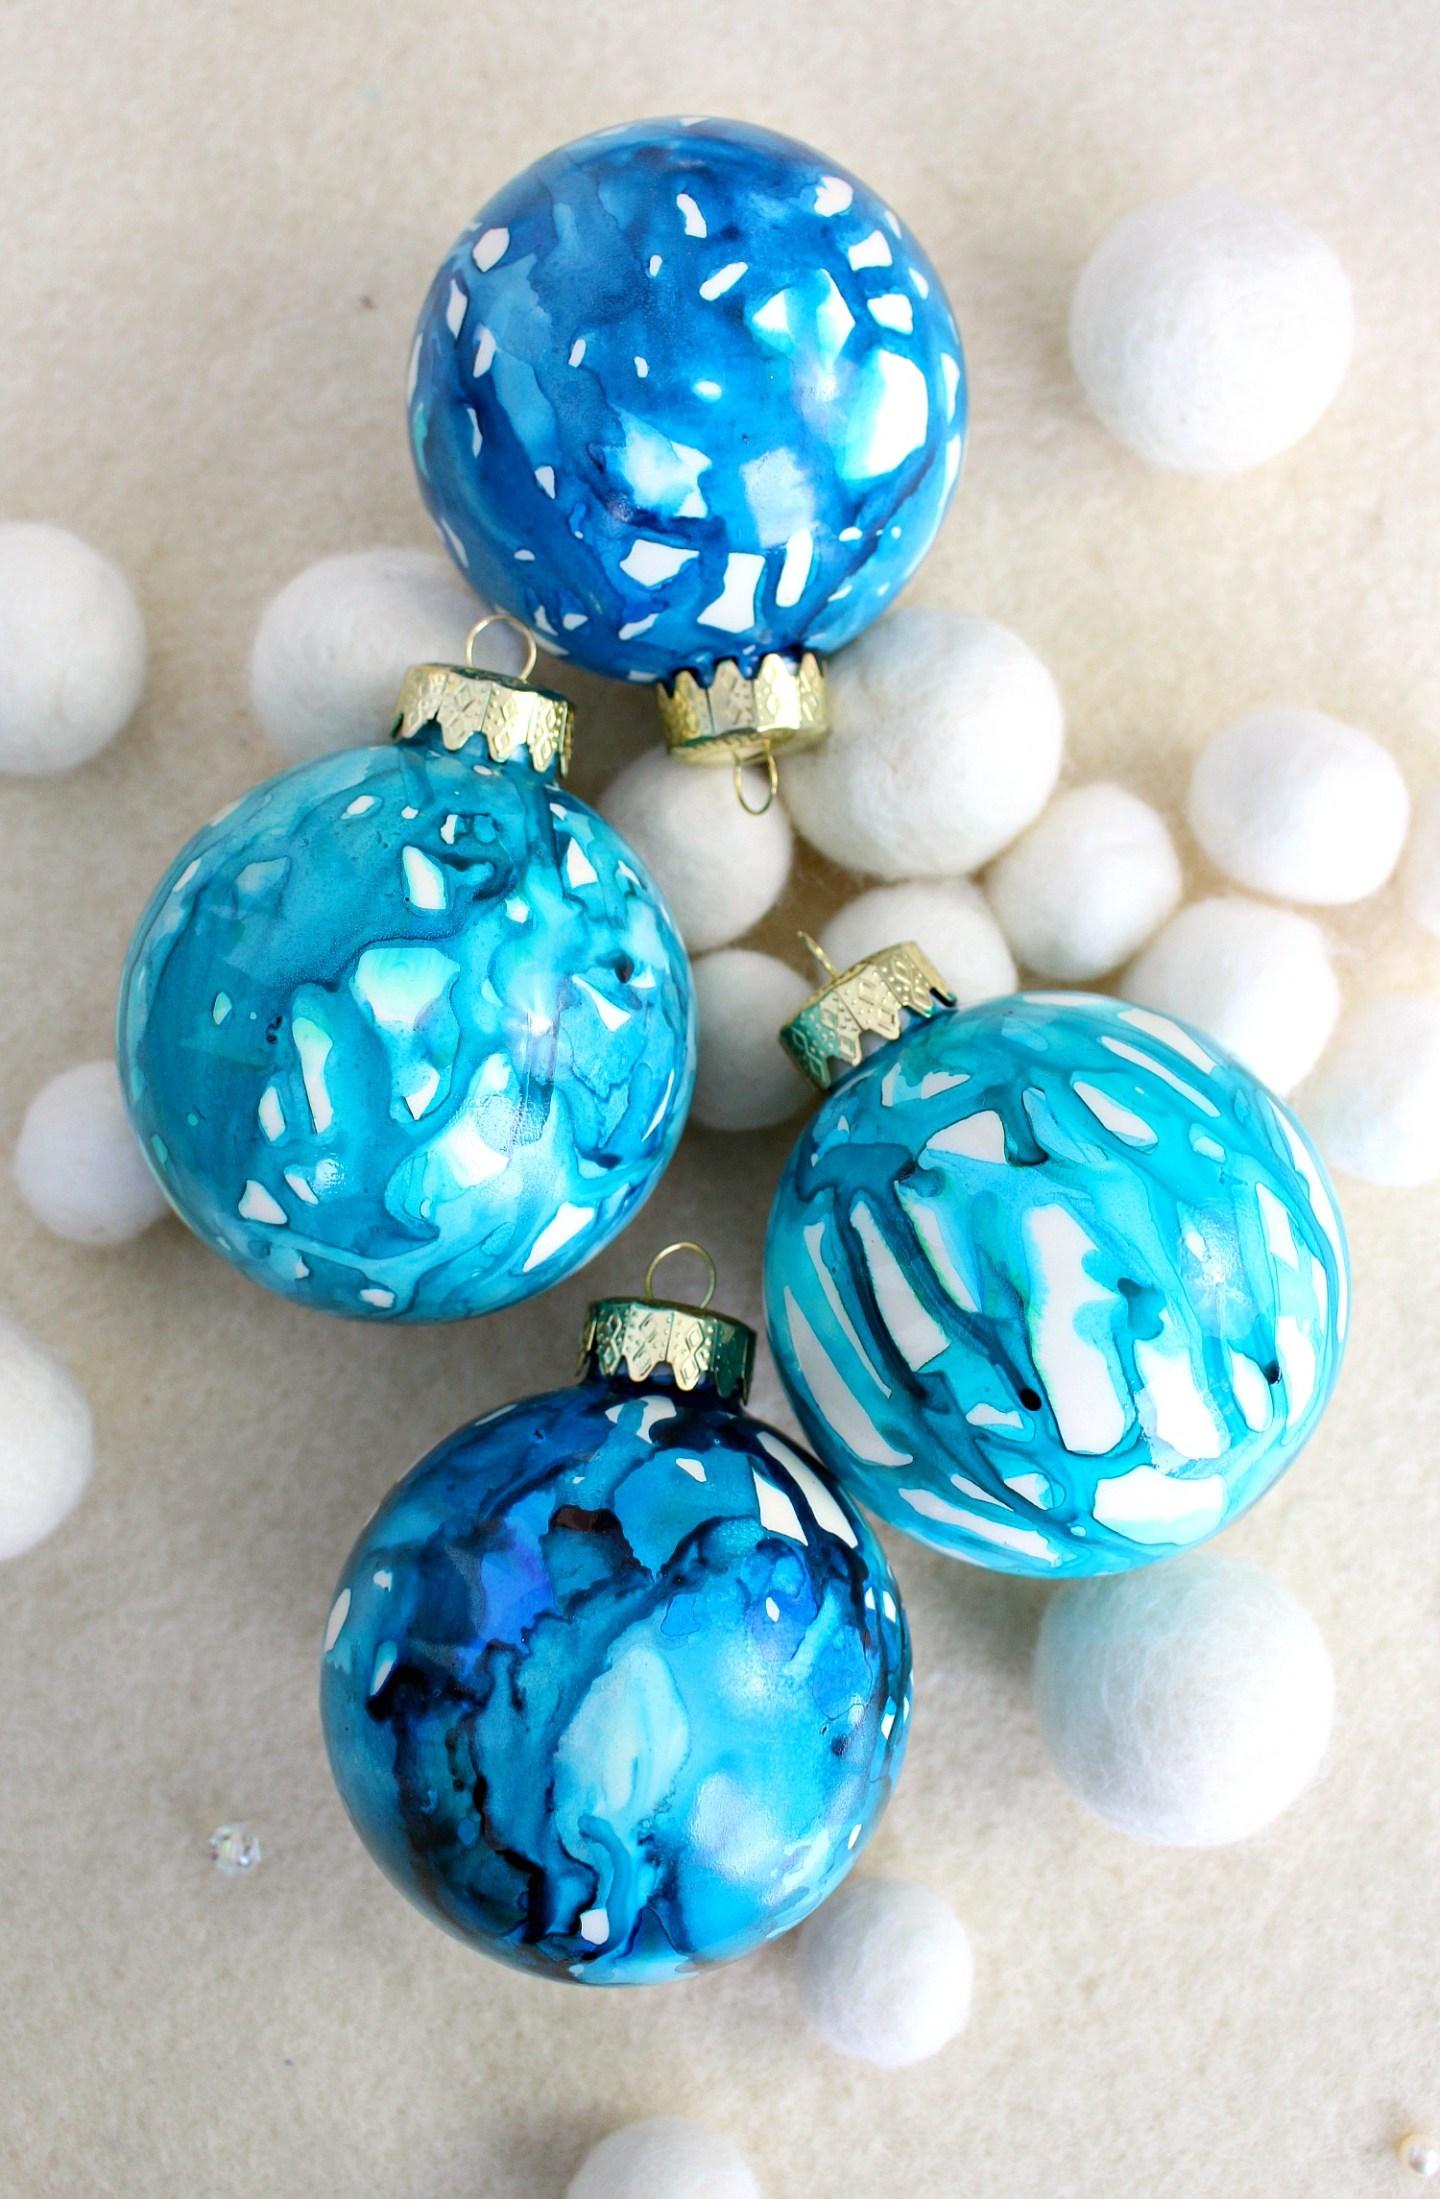 DIY Alcohol Ink Christmas Ornaments